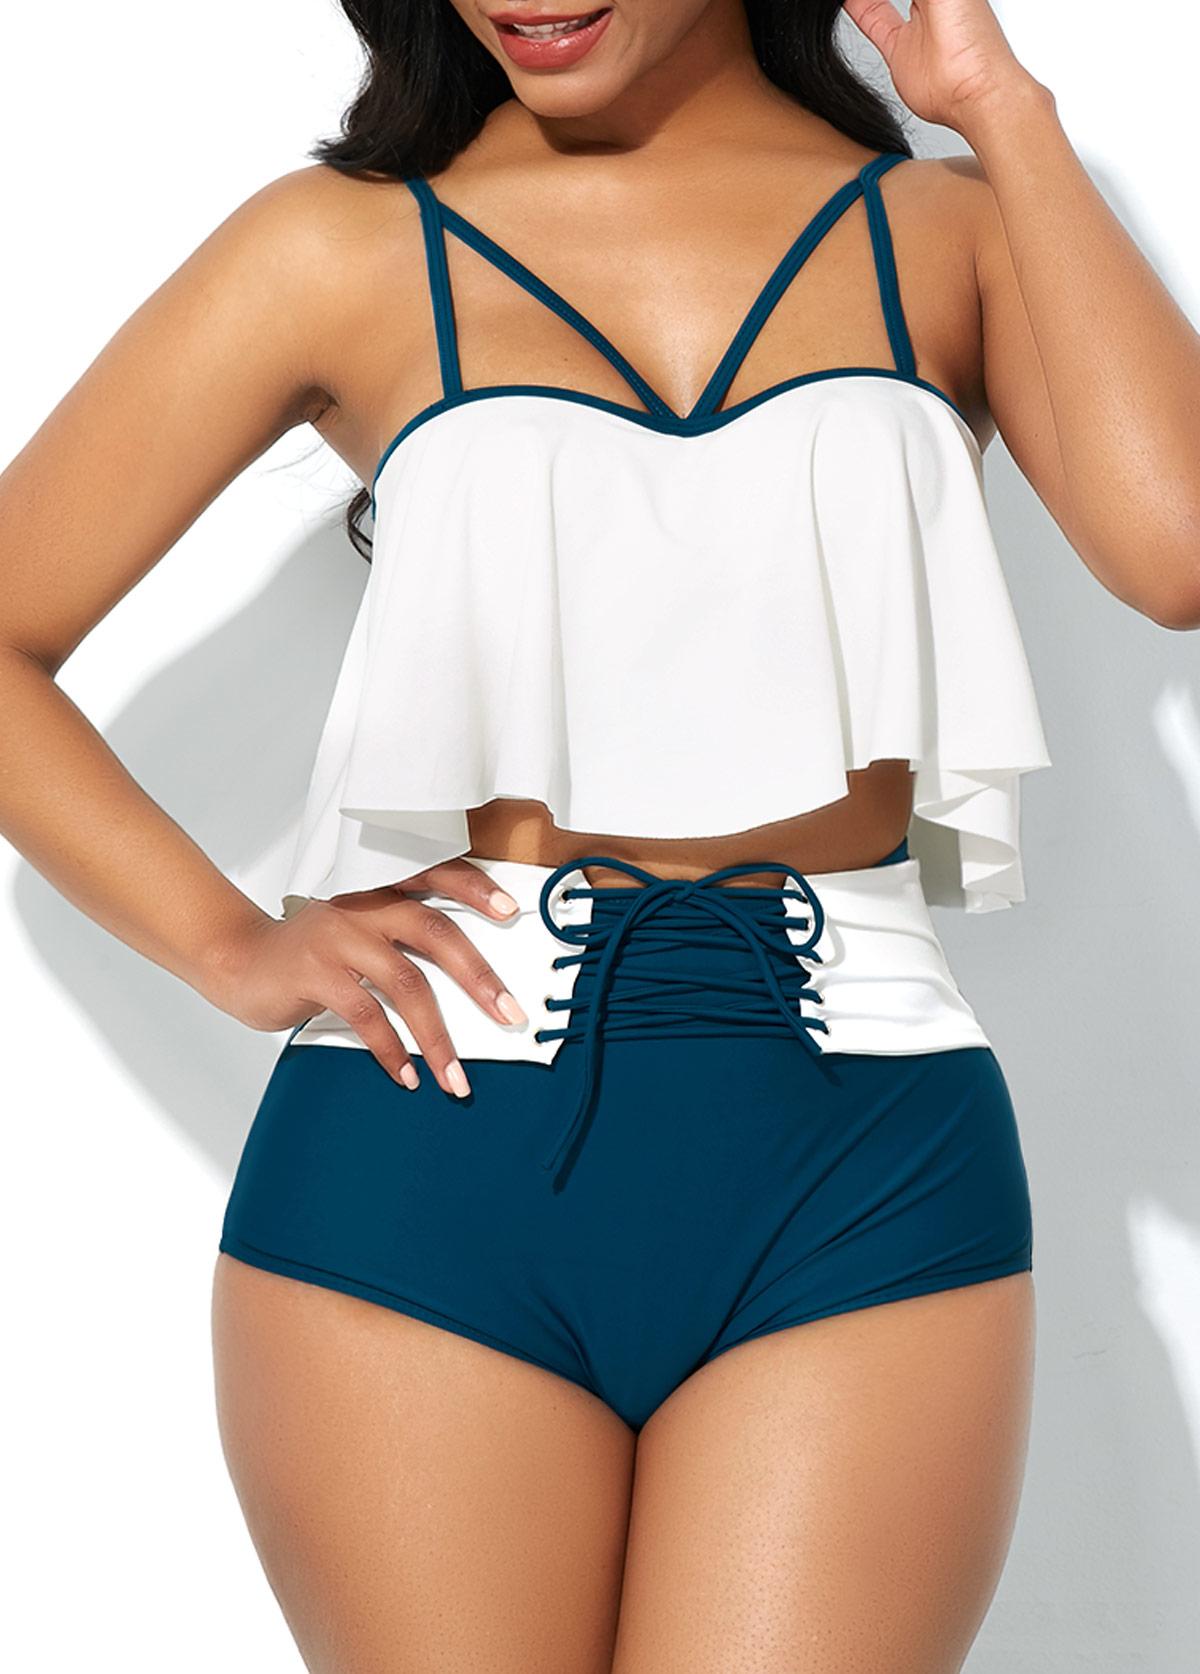 Spaghetti Strap Bikini Top and Lace Up Panty